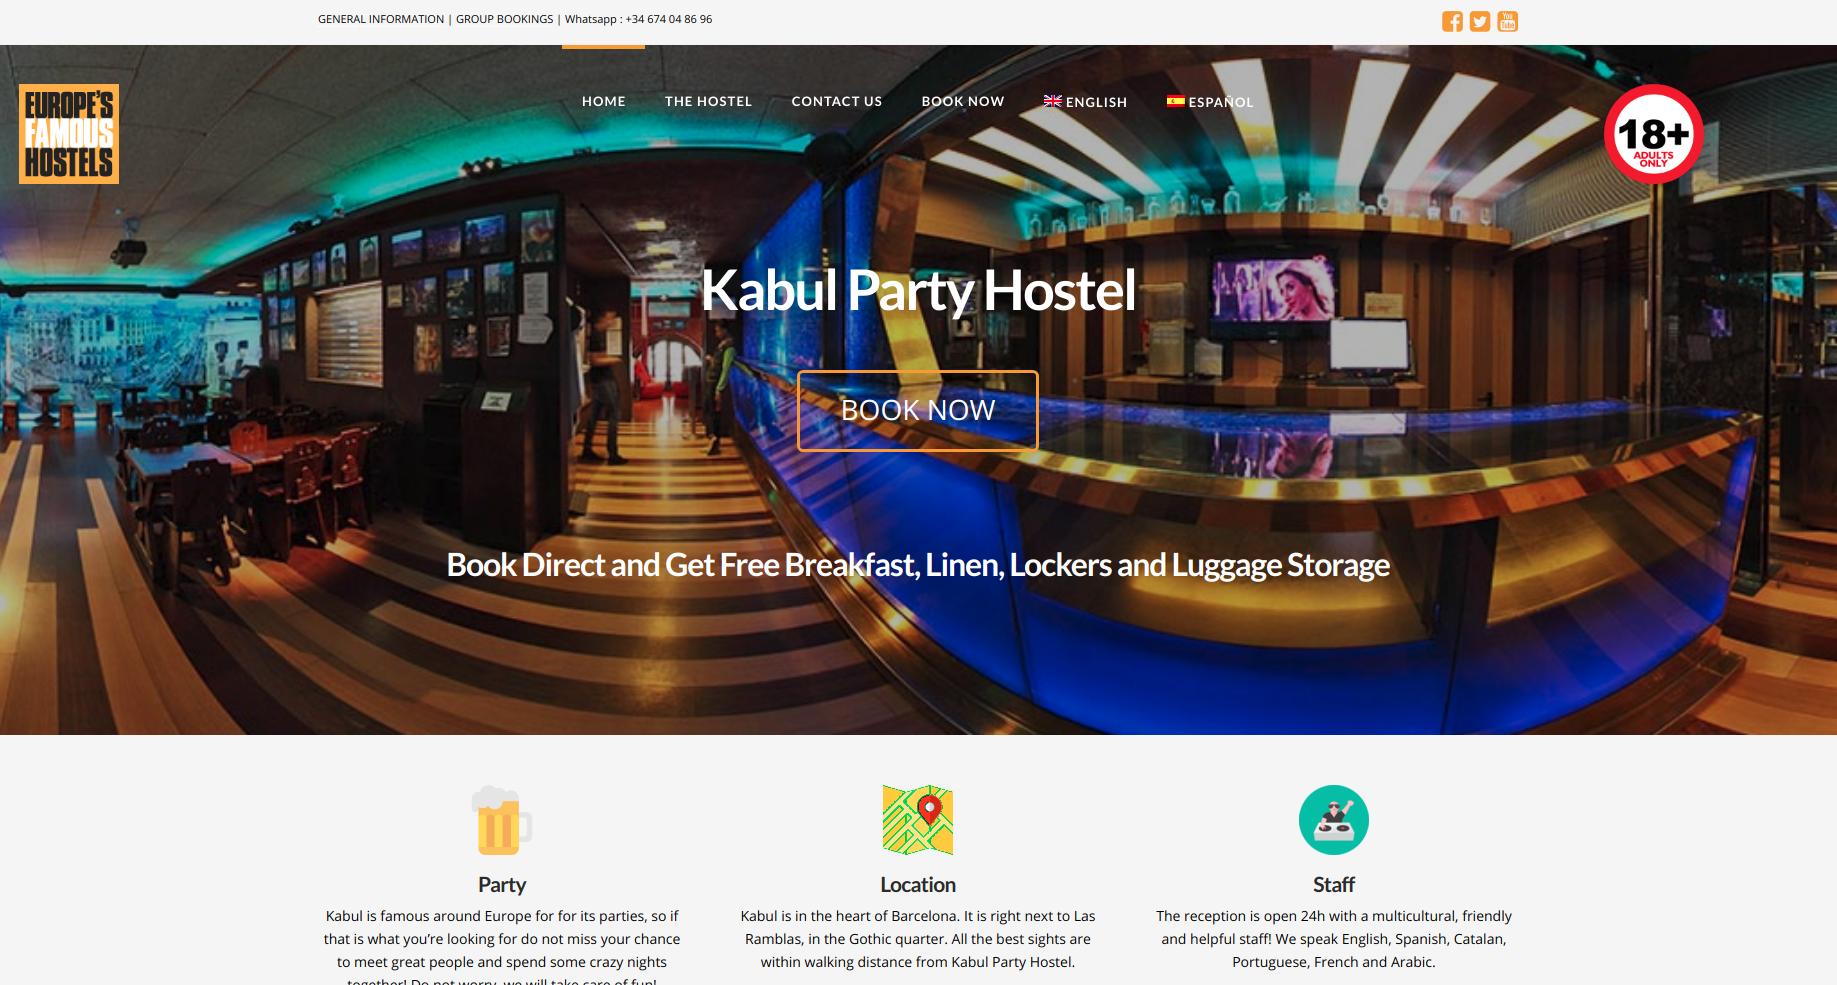 Image Kabul Hostel Website